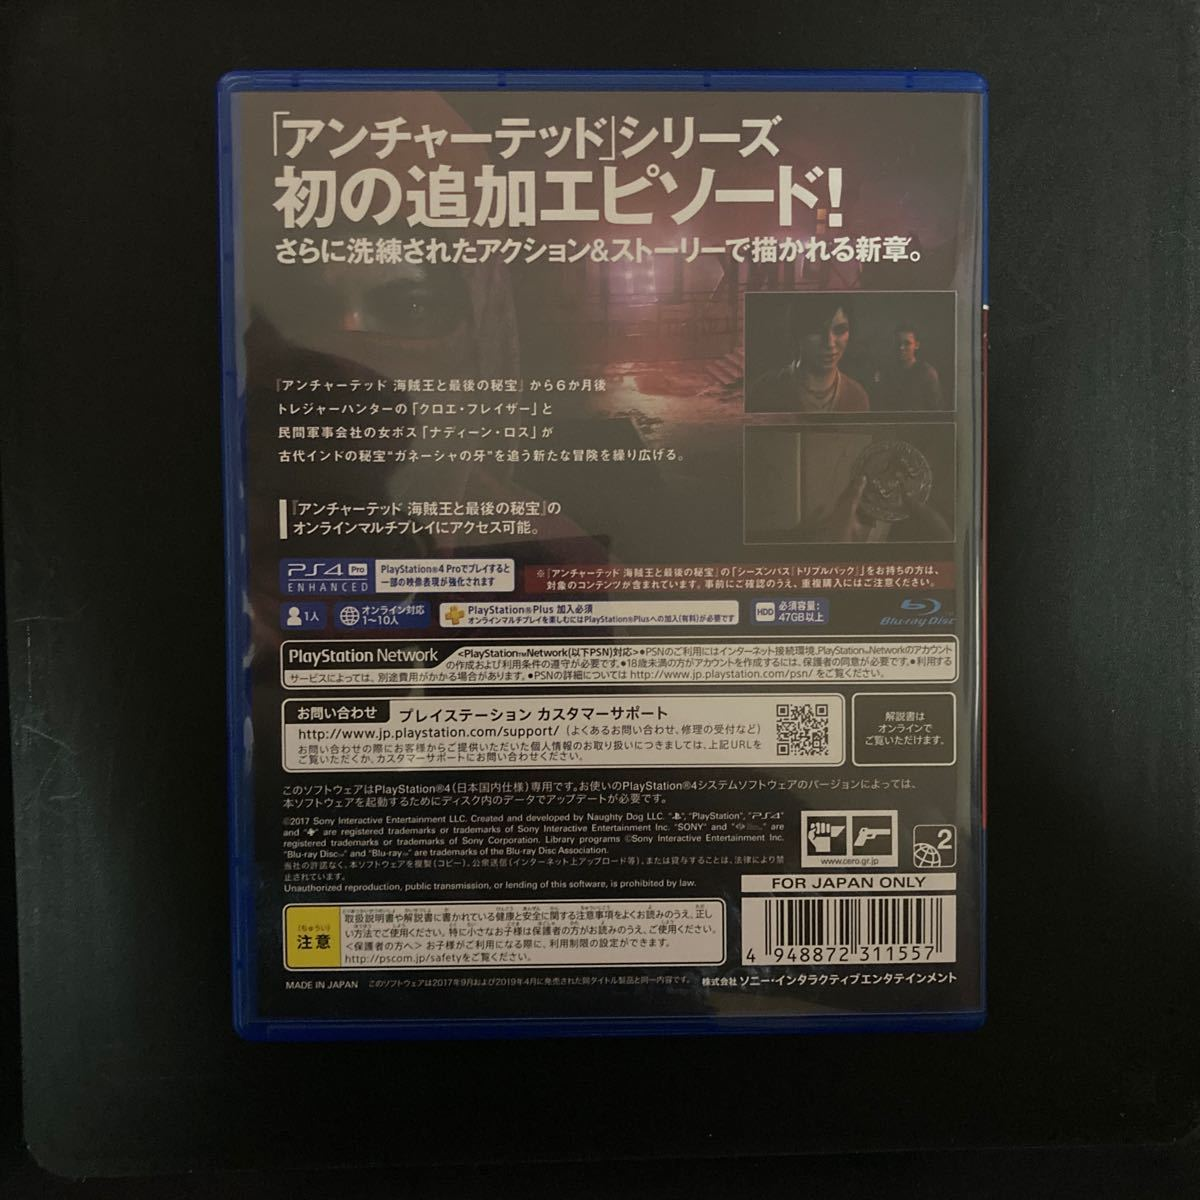 【PS4】 アンチャーテッド 古代神の秘宝 [PlayStation Hits]